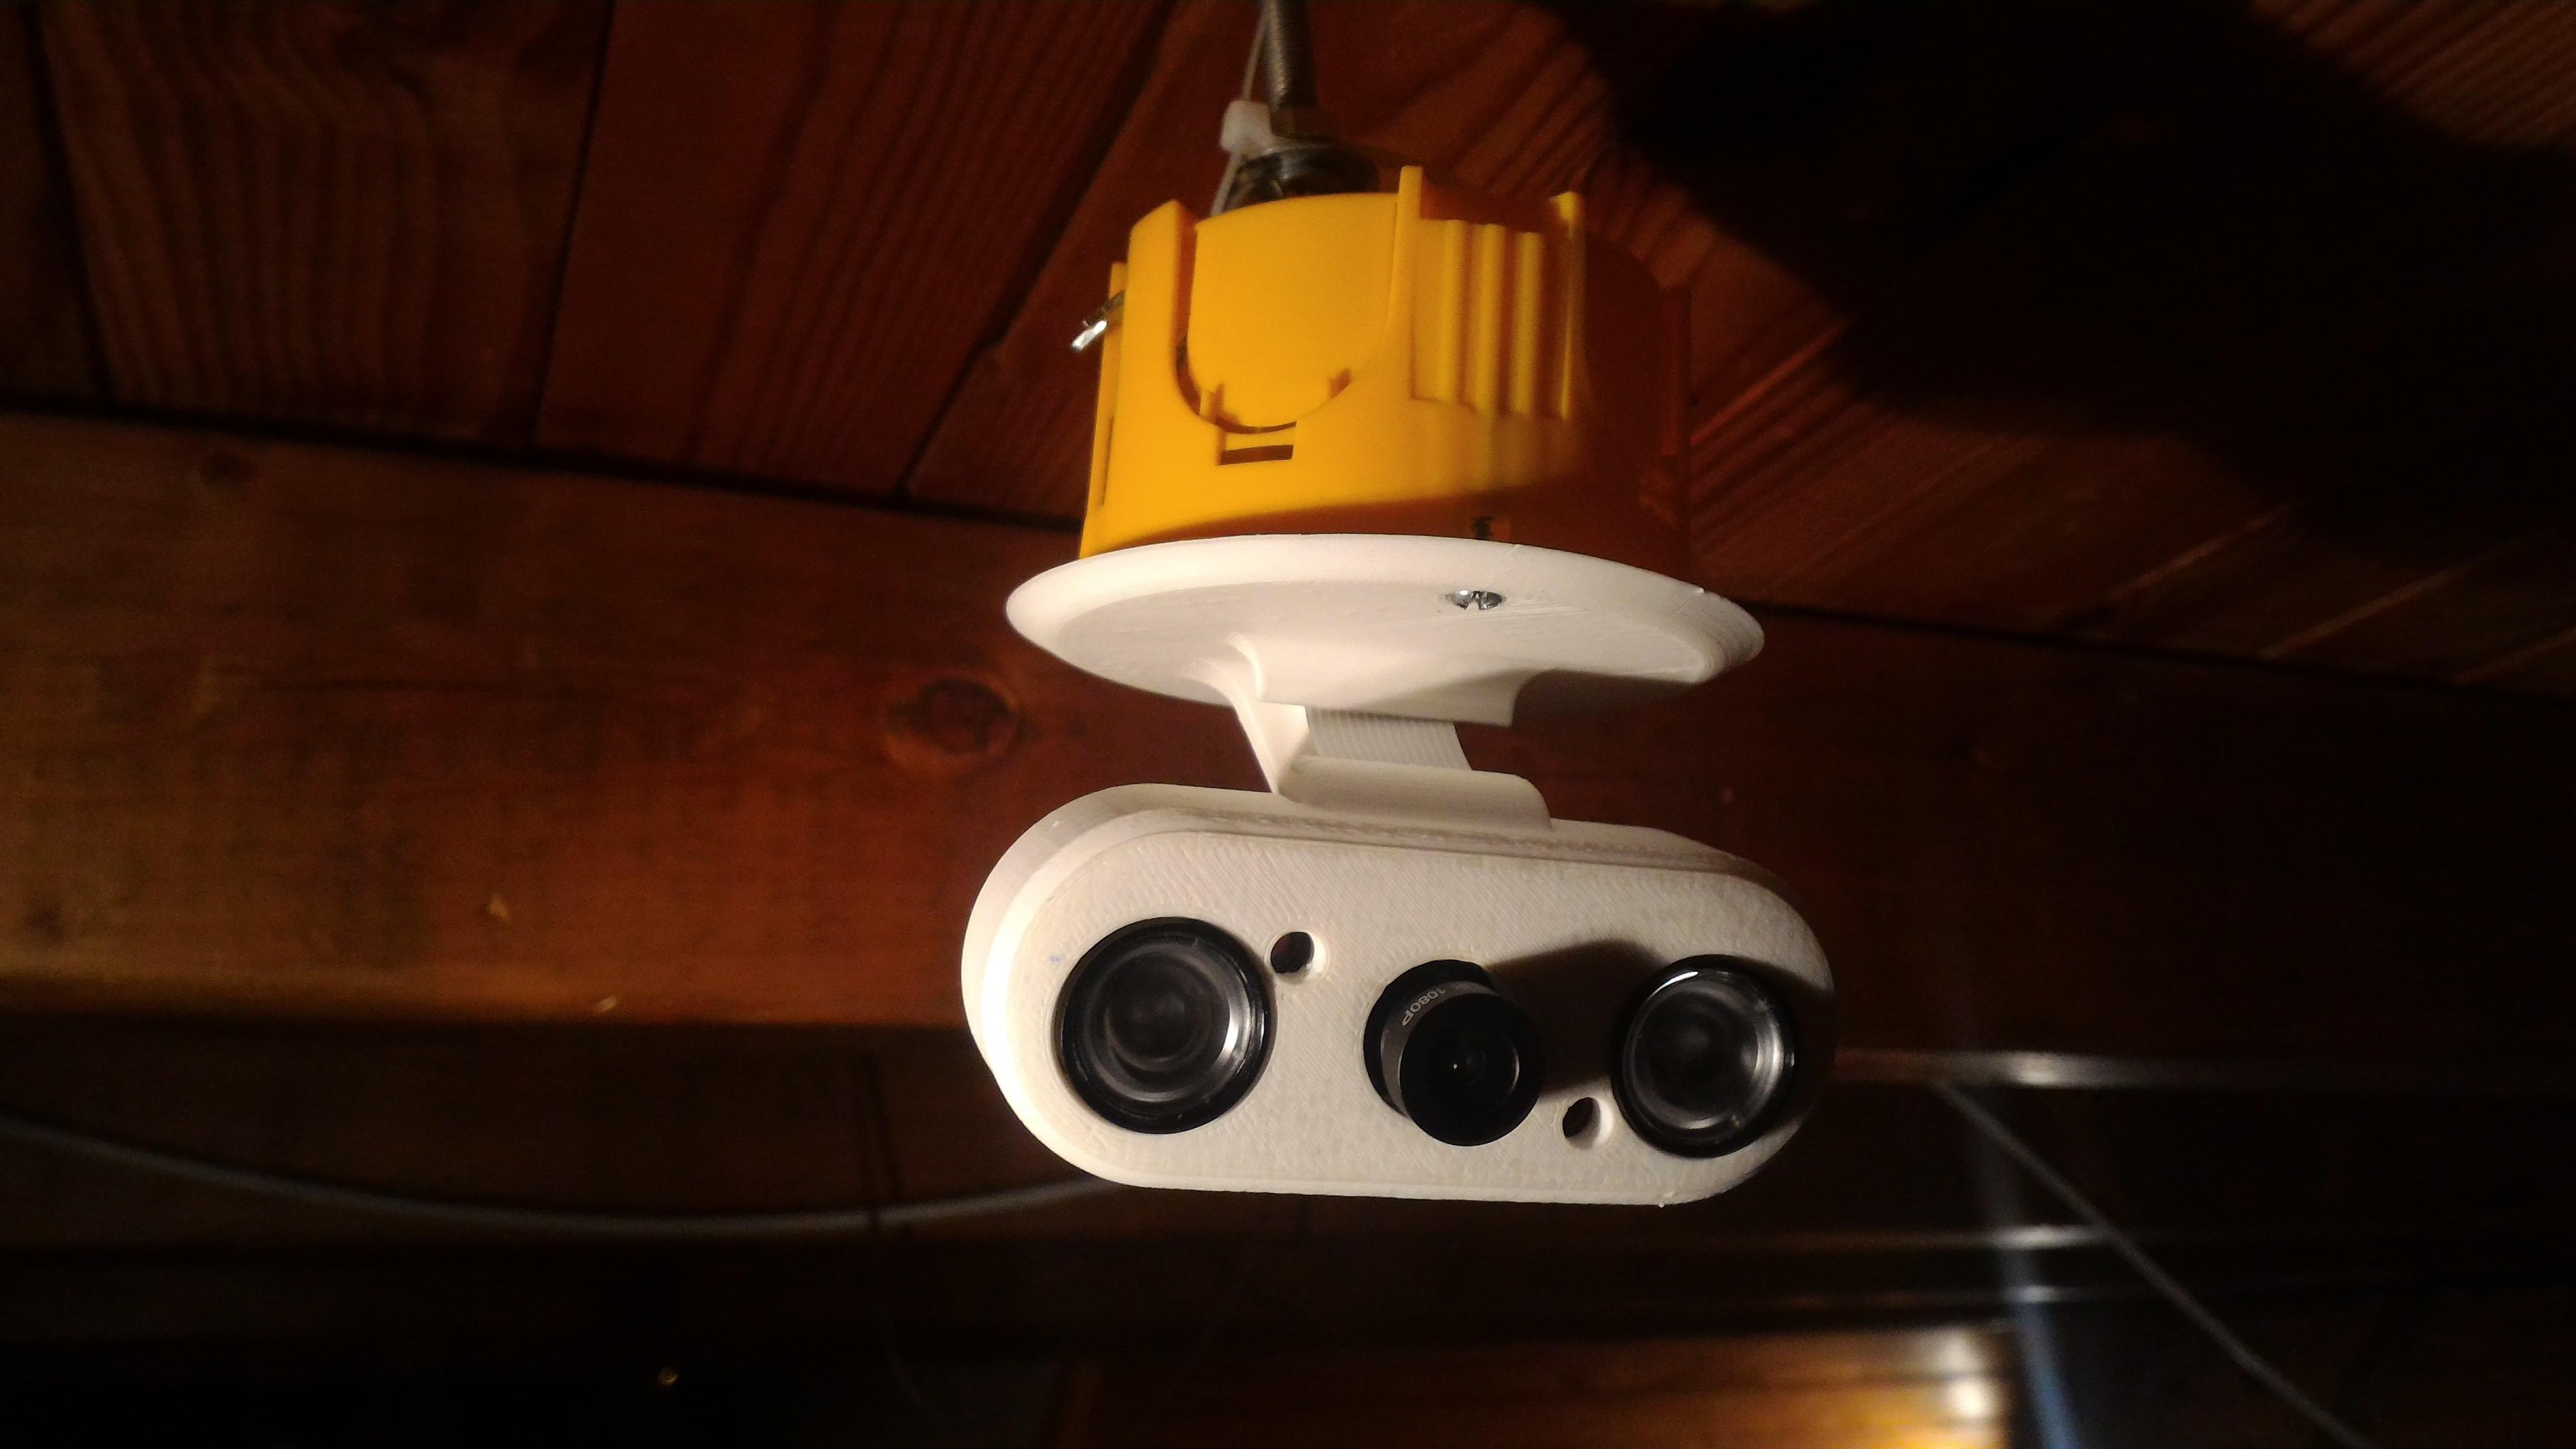 P_20171103_191900.jpg Download free STL file rpi LED IR camera support • 3D printer model, PierreMaillard